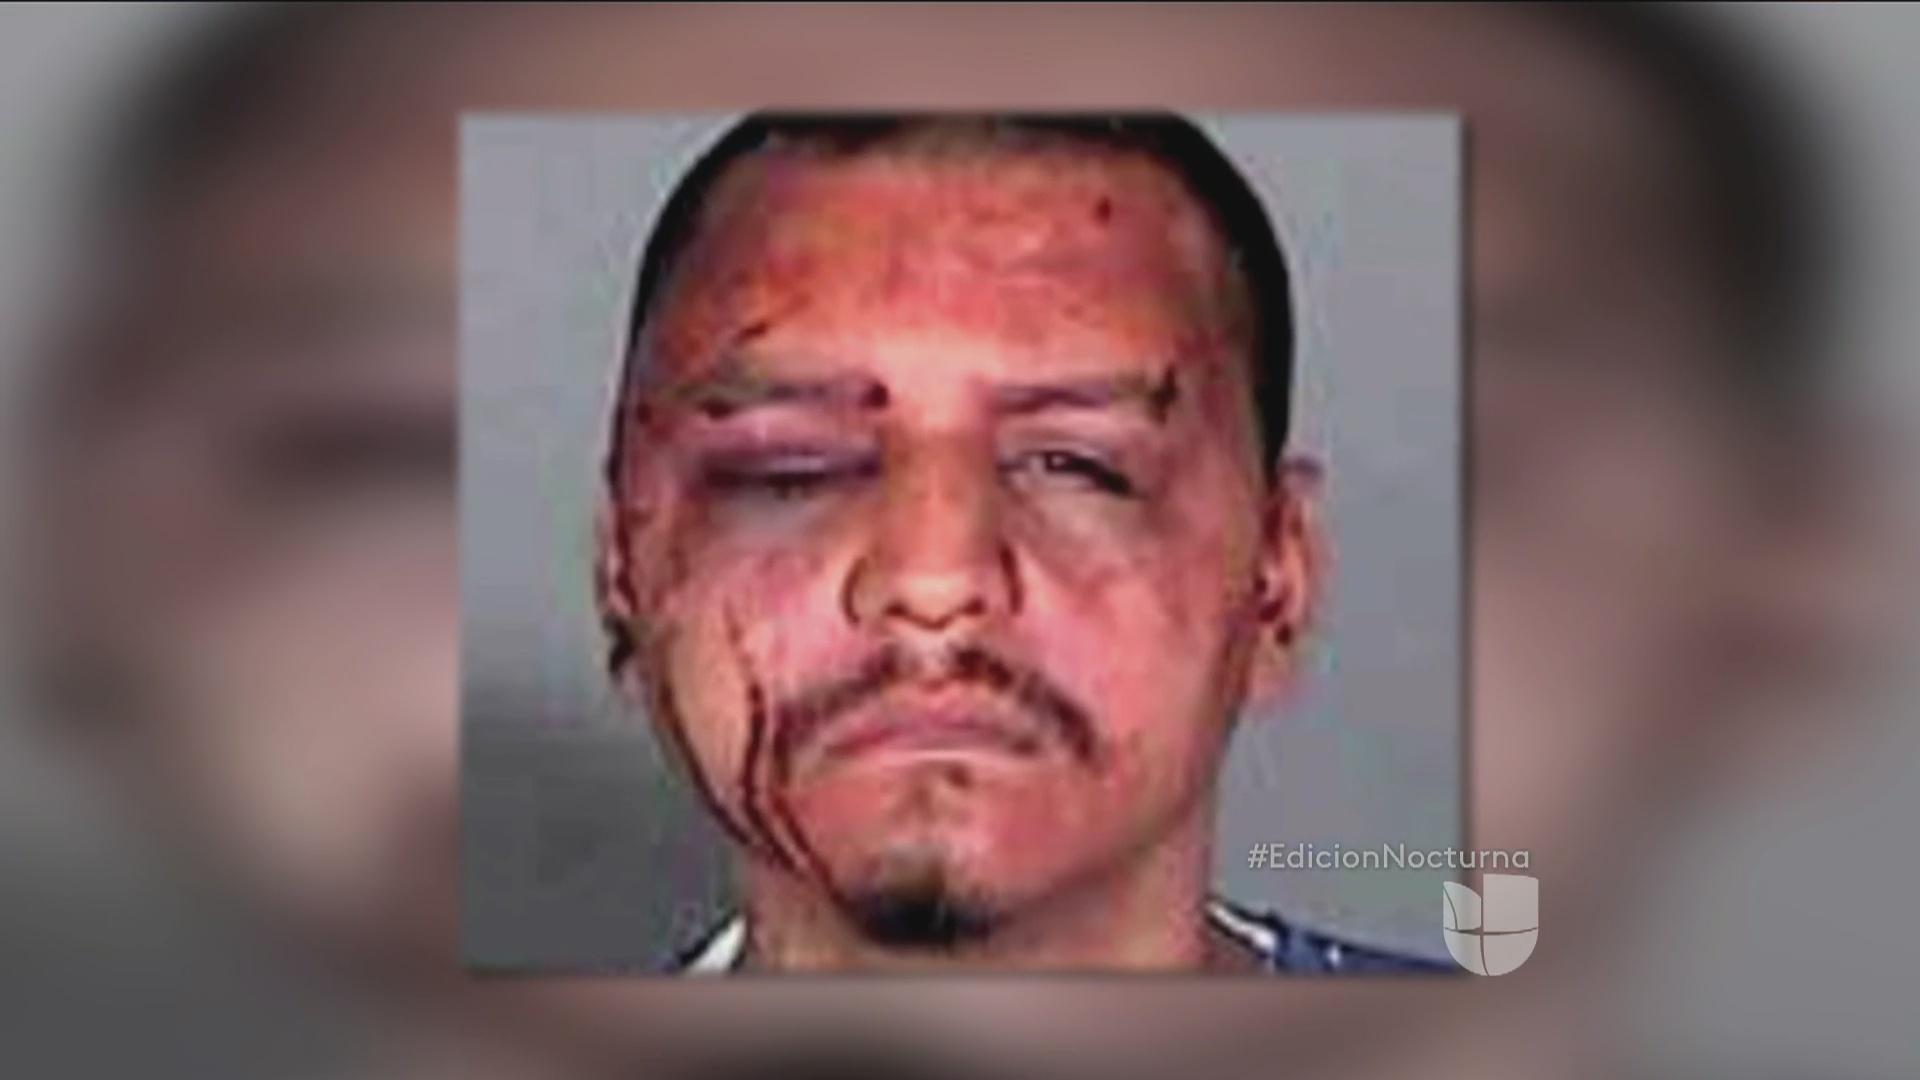 Golpean a hispano por llevar un celular a la cárcel